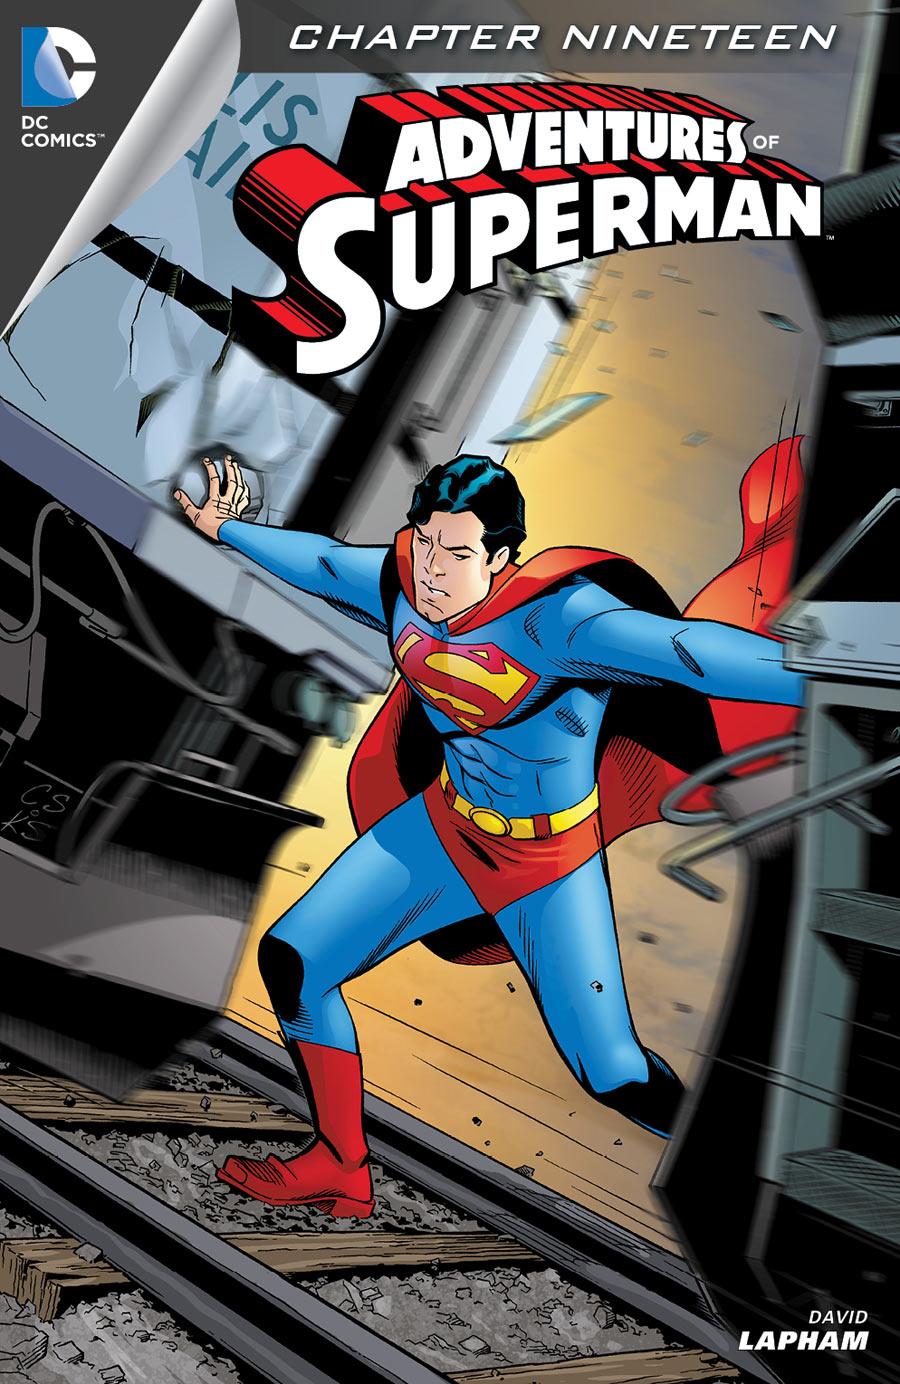 ADVENTURES OF SUPERMAN #19